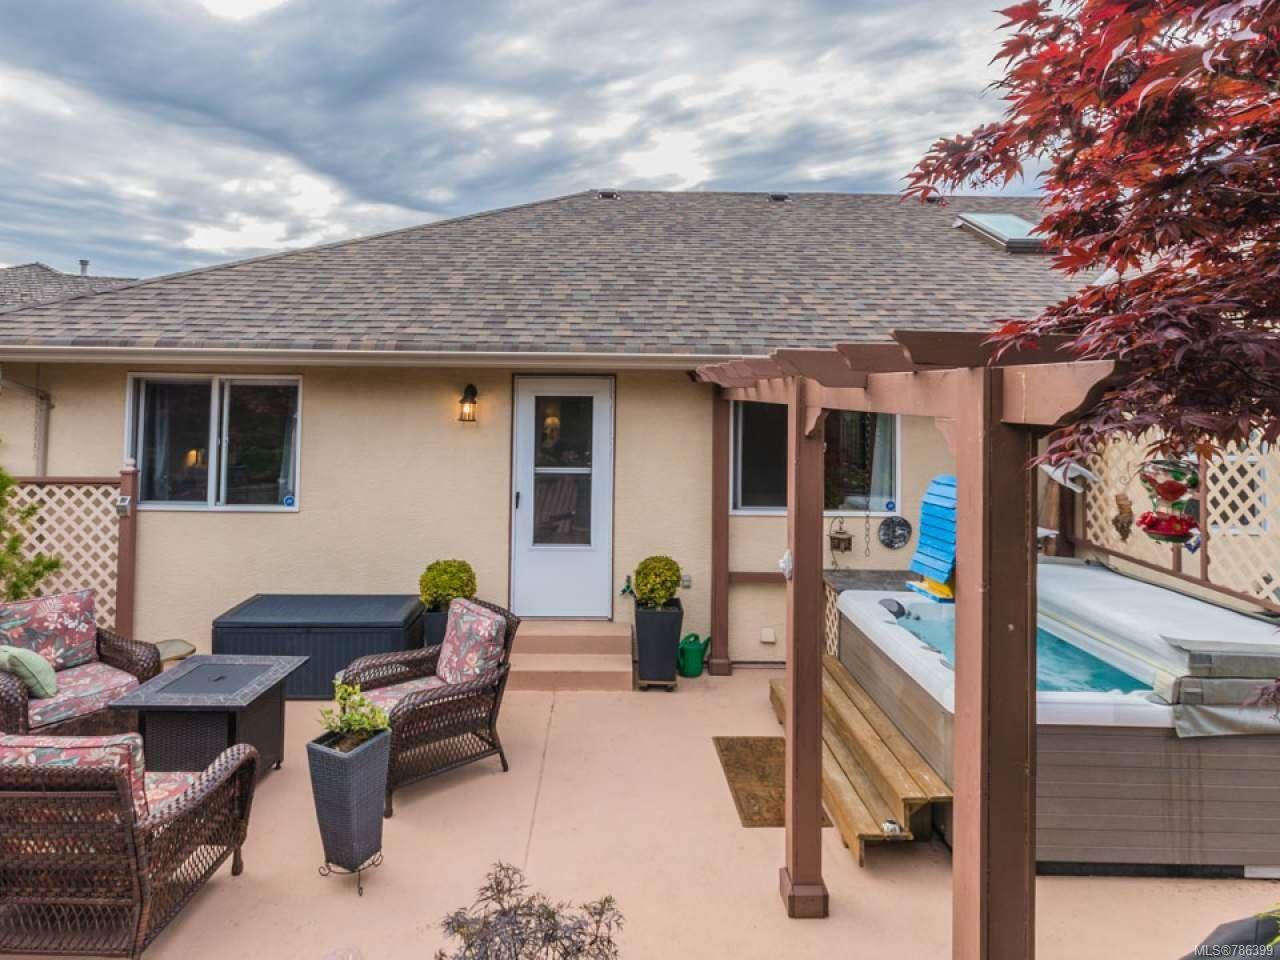 Photo 30: Photos: 5371 HIGHRIDGE PLACE in NANAIMO: Na North Nanaimo House for sale (Nanaimo)  : MLS®# 786399